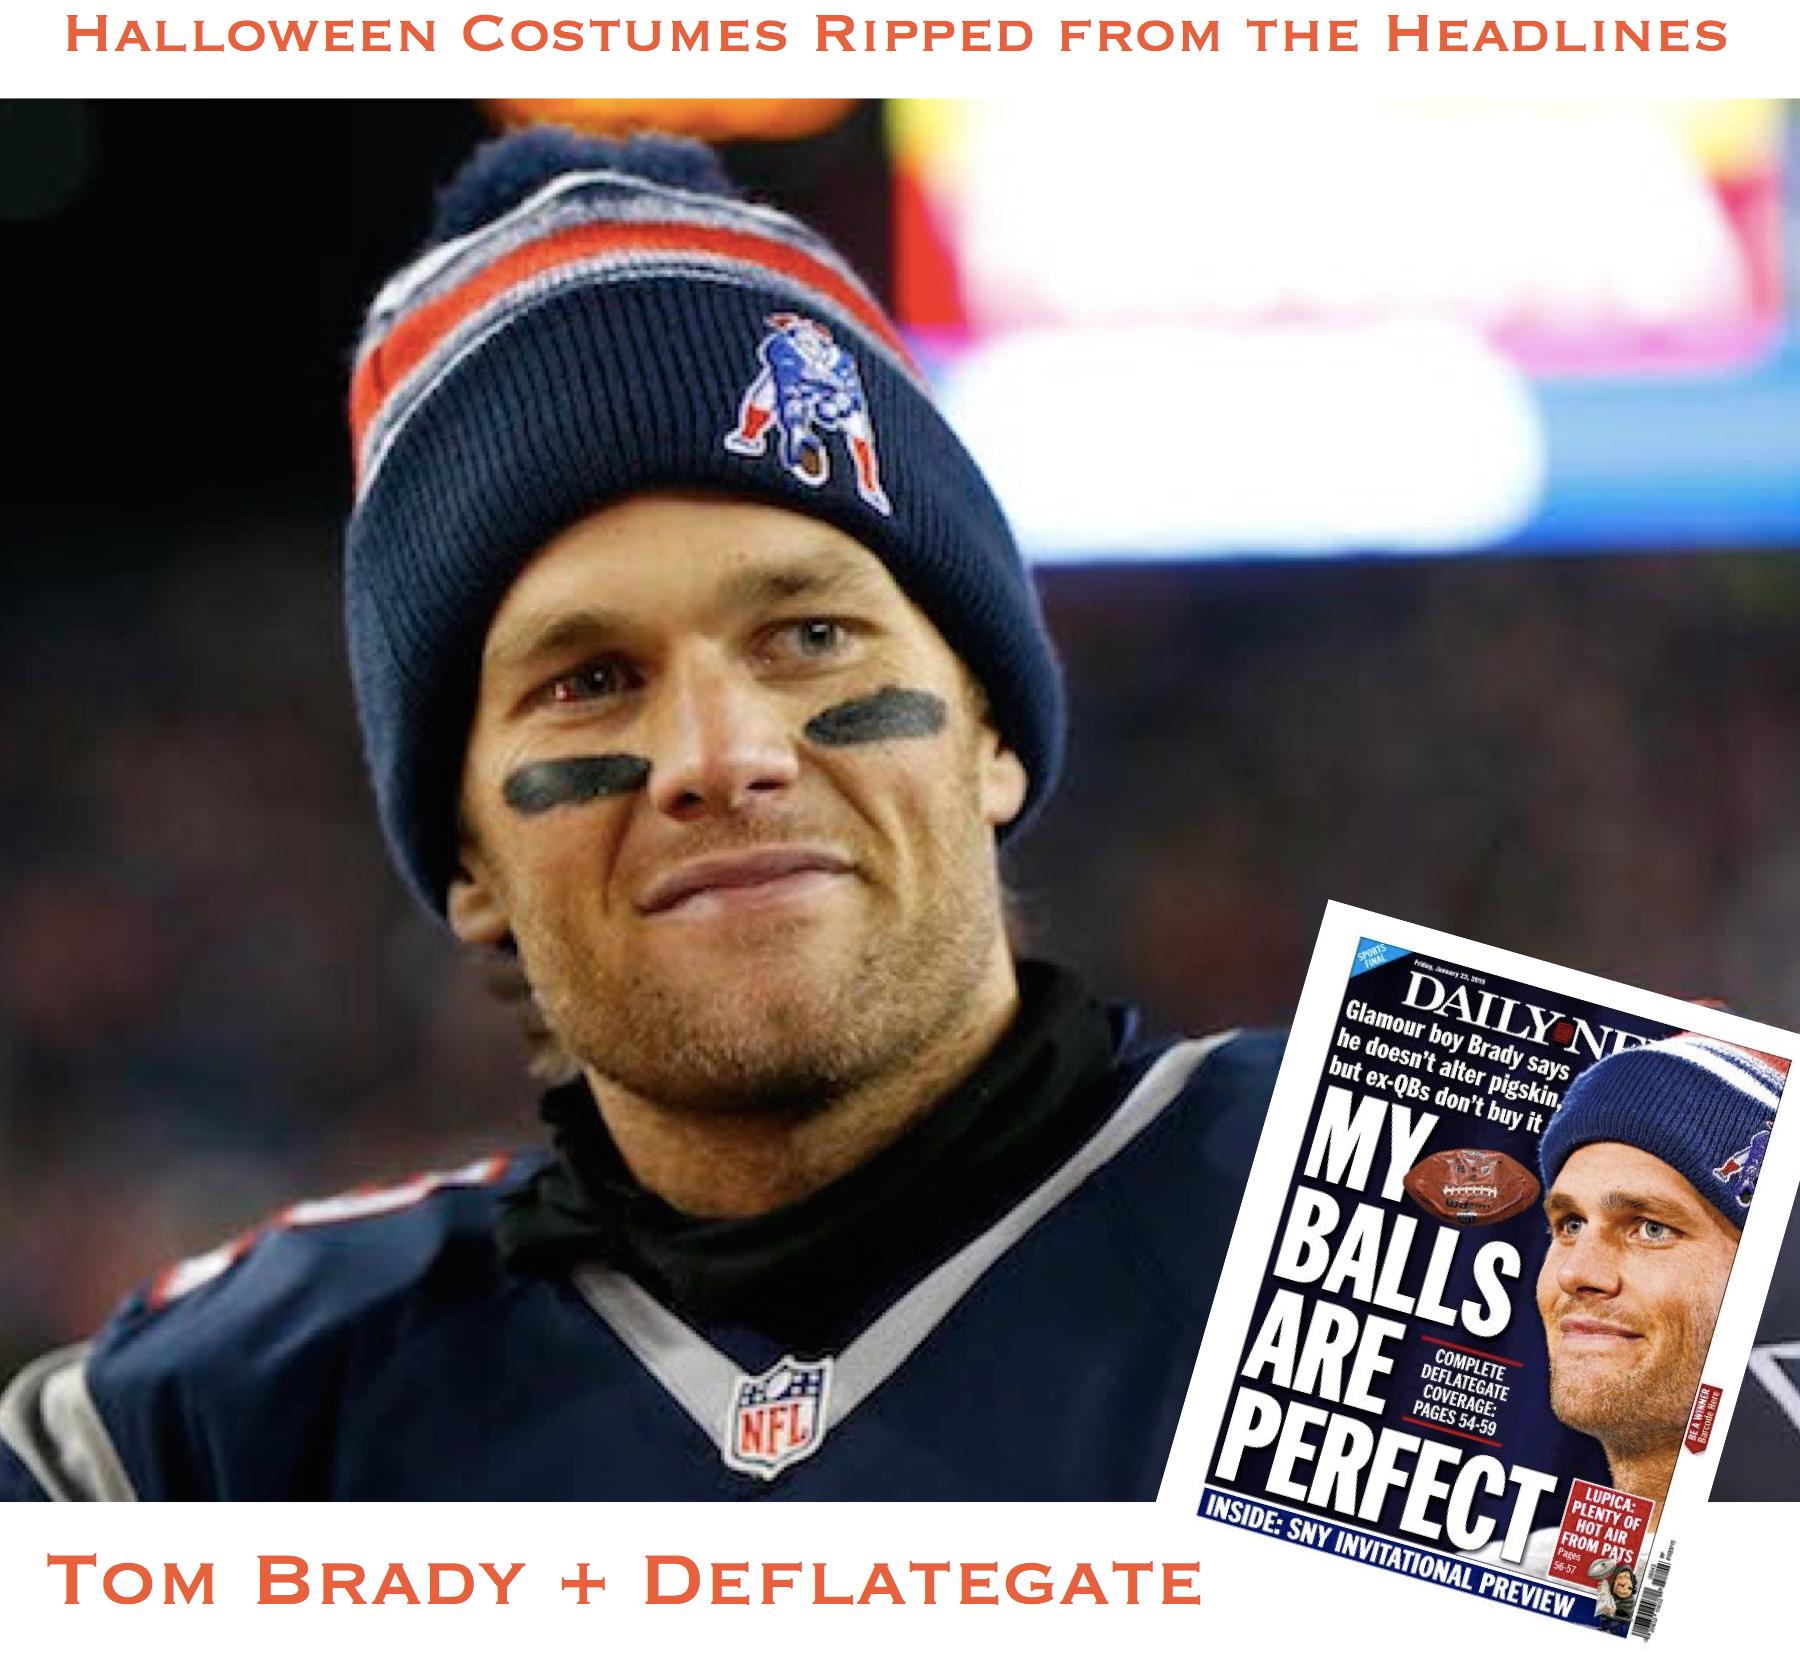 Halloween Costumes Ripped from the Headlines Tom Brady Deflategate